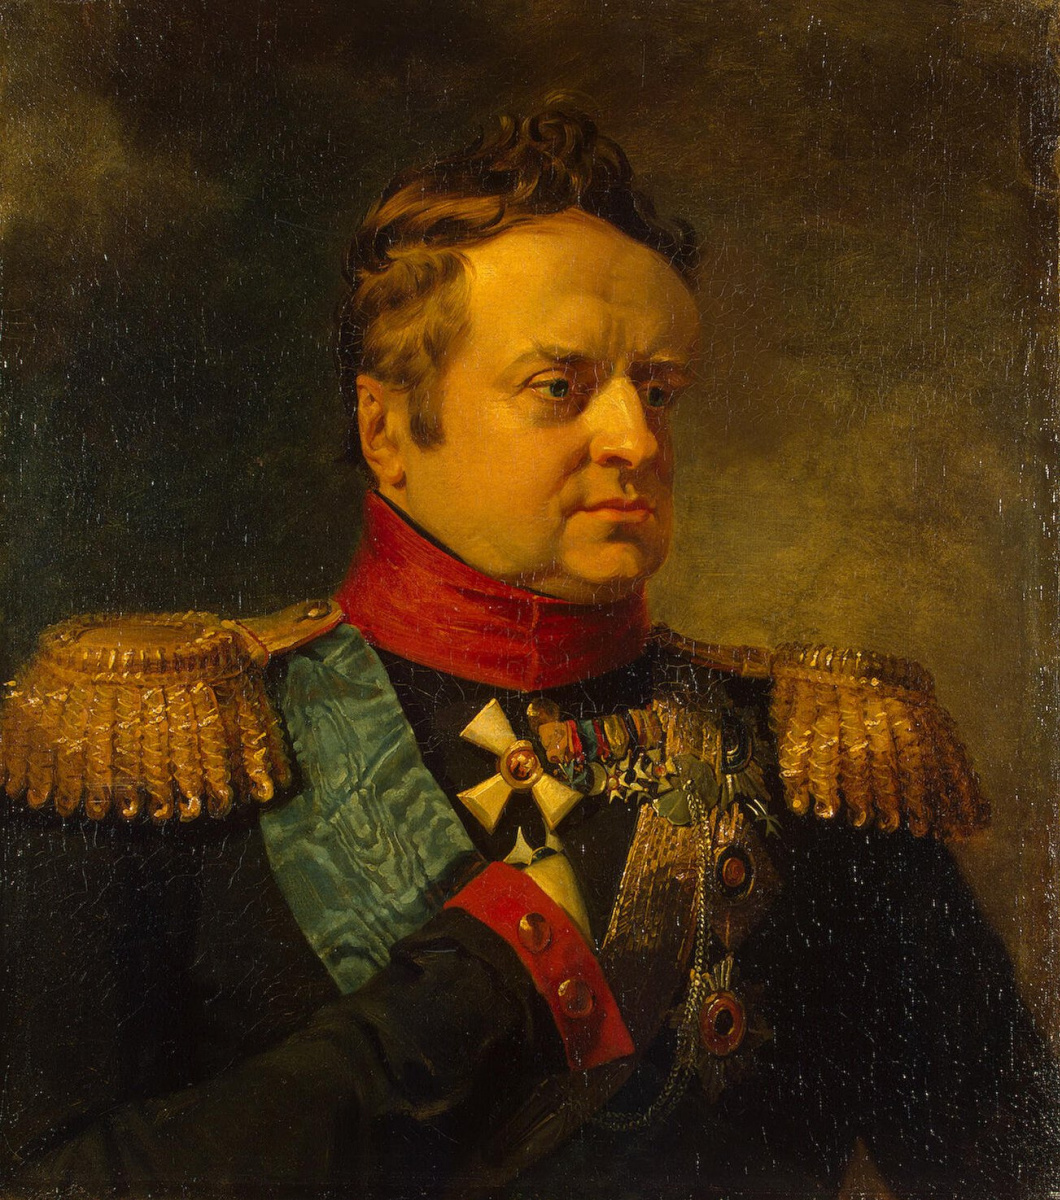 Джордж Доу. Портрет принца Александра Вюртембергского